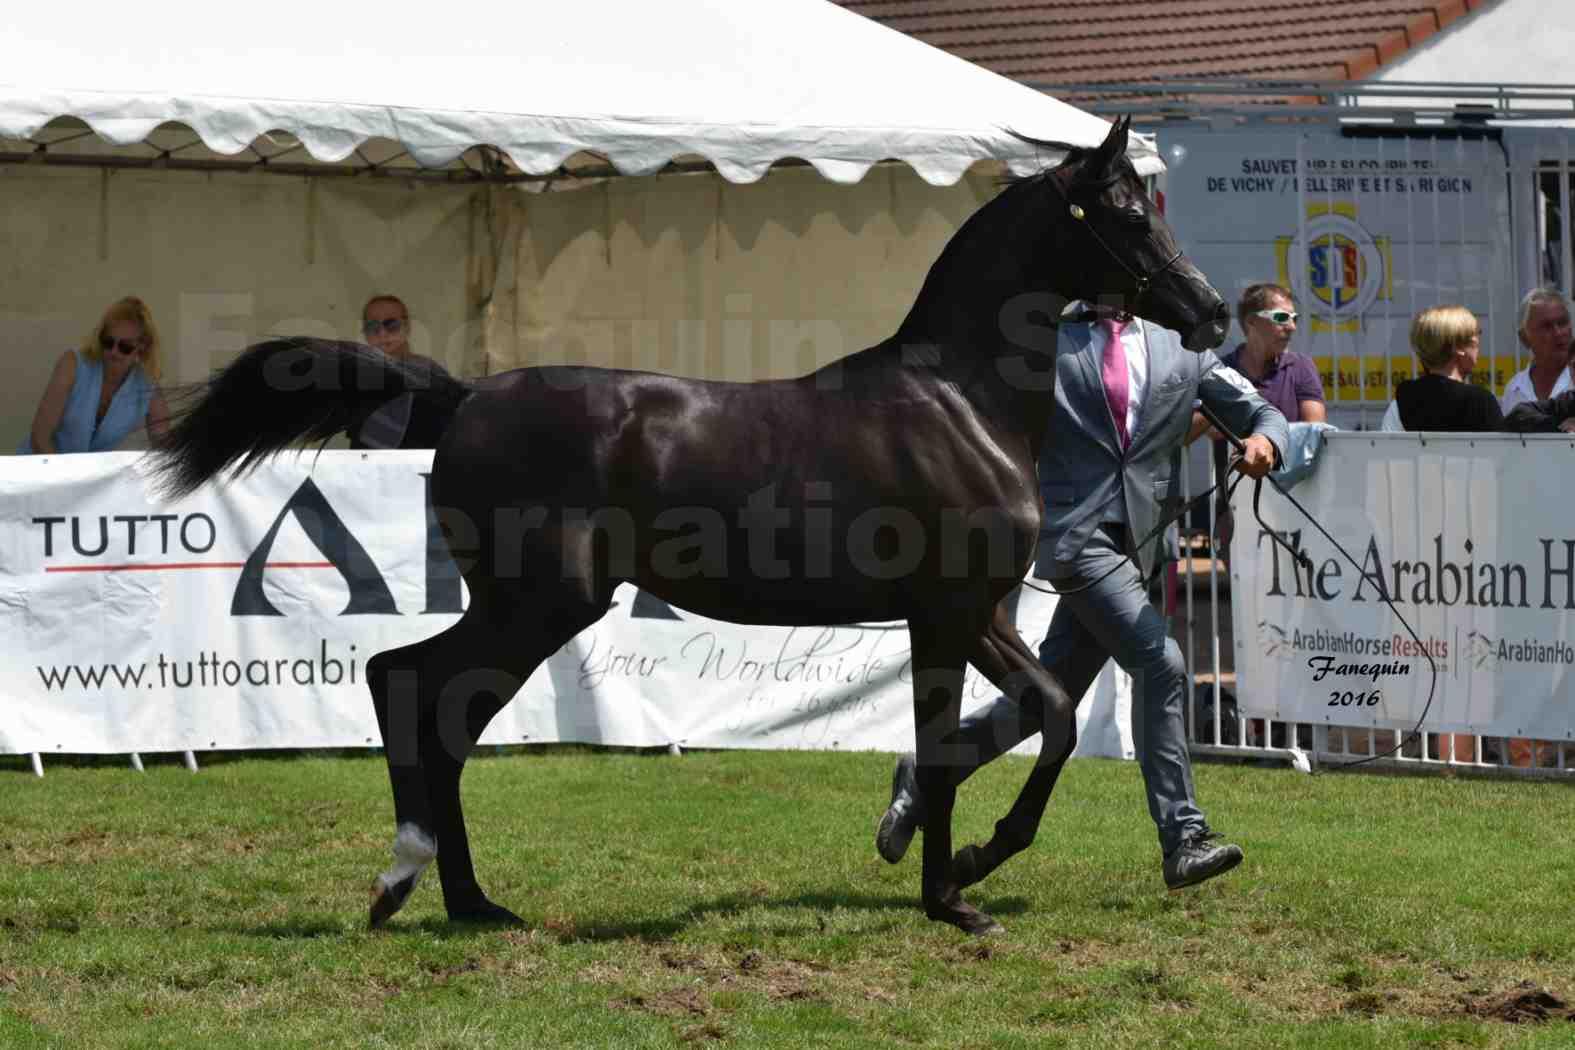 International Arabian Horse Show B de VICHY 2016 - ANNALISA ALIH - Notre Sélection - 1